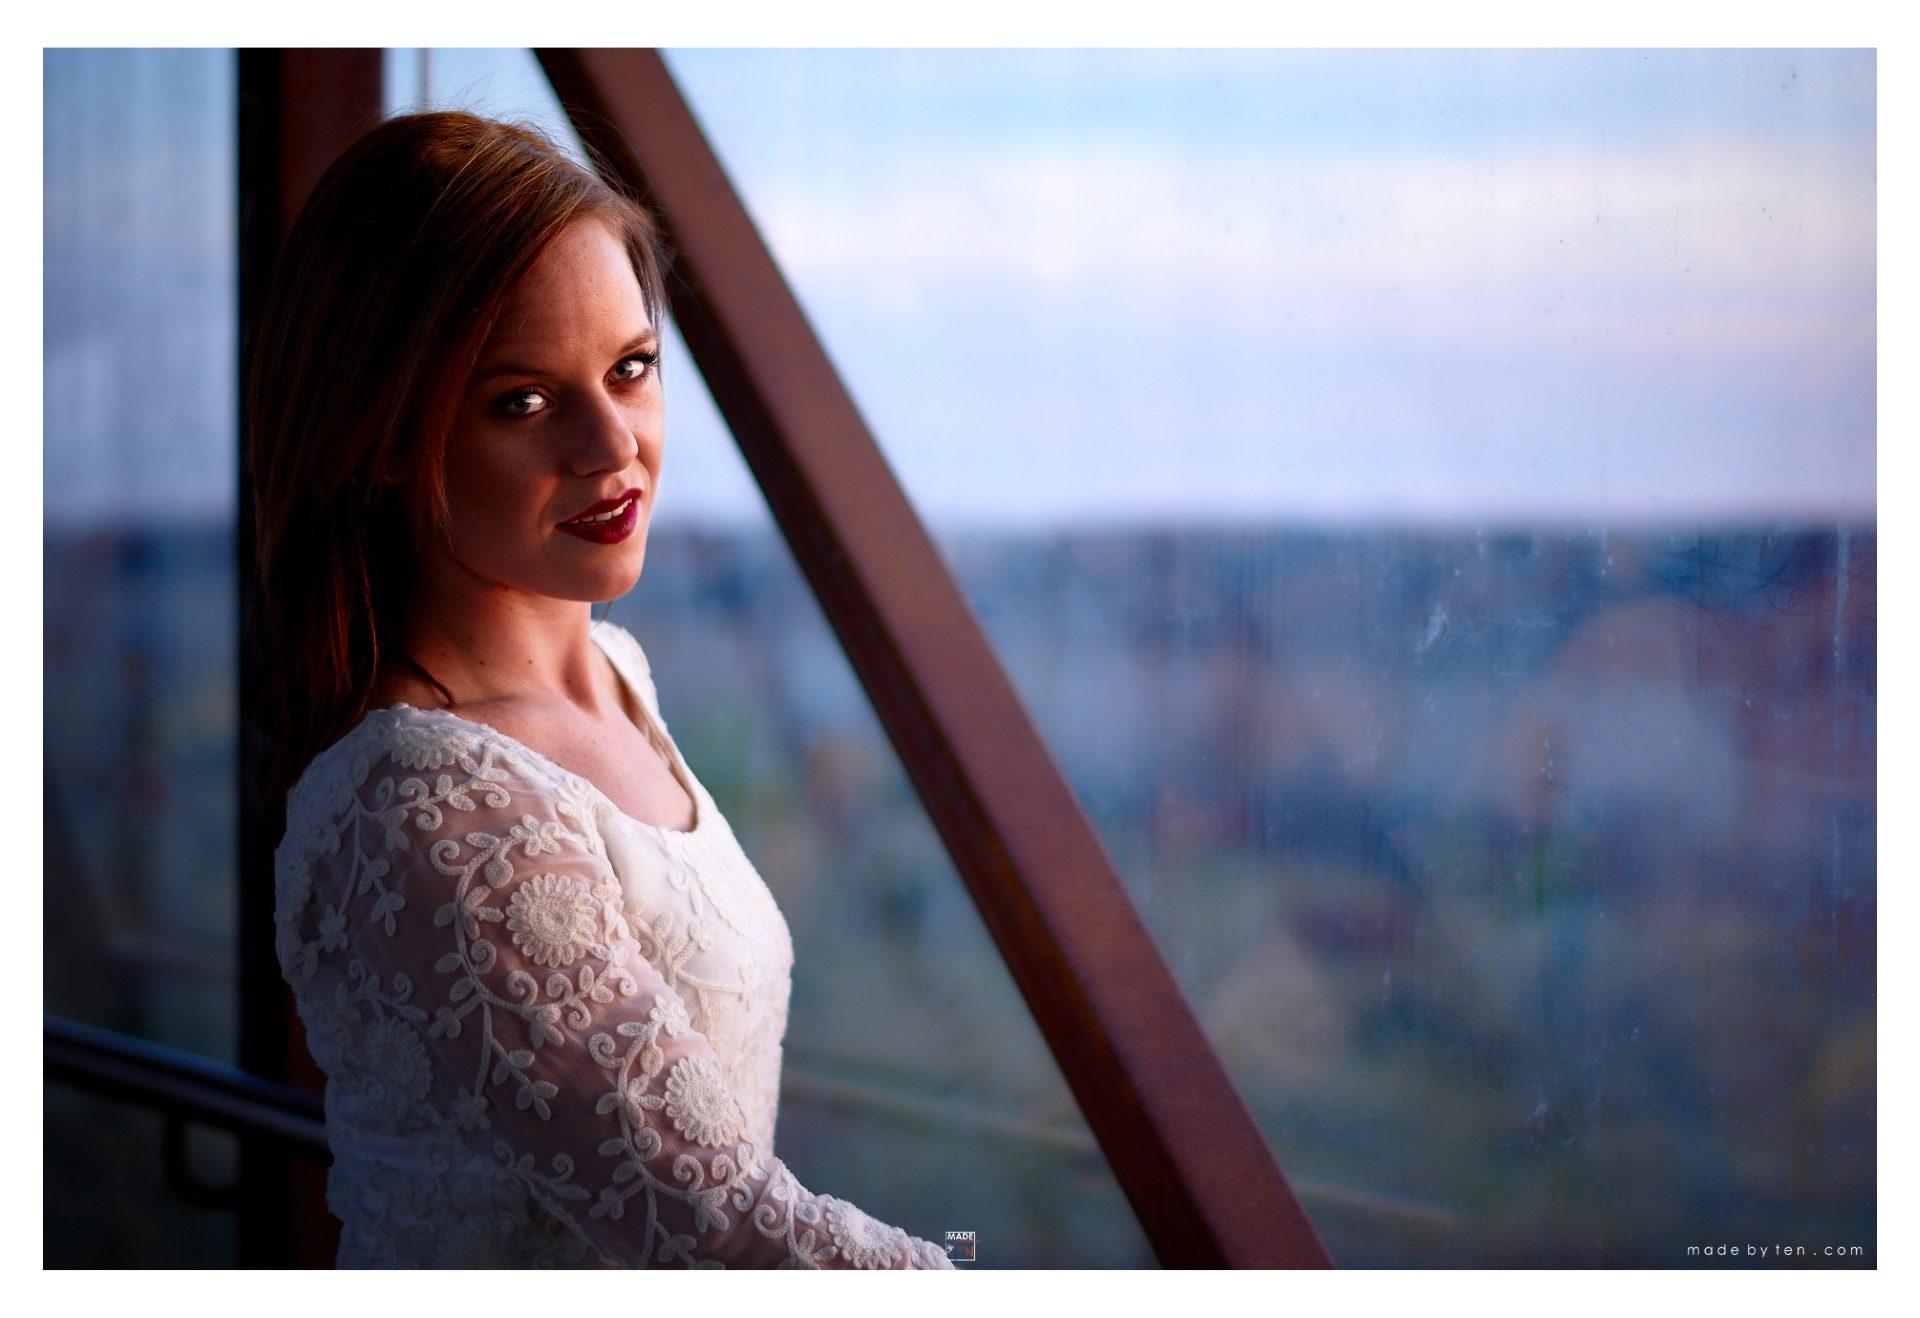 Woman Sunset Bridge - GTA Women Portrait Photography